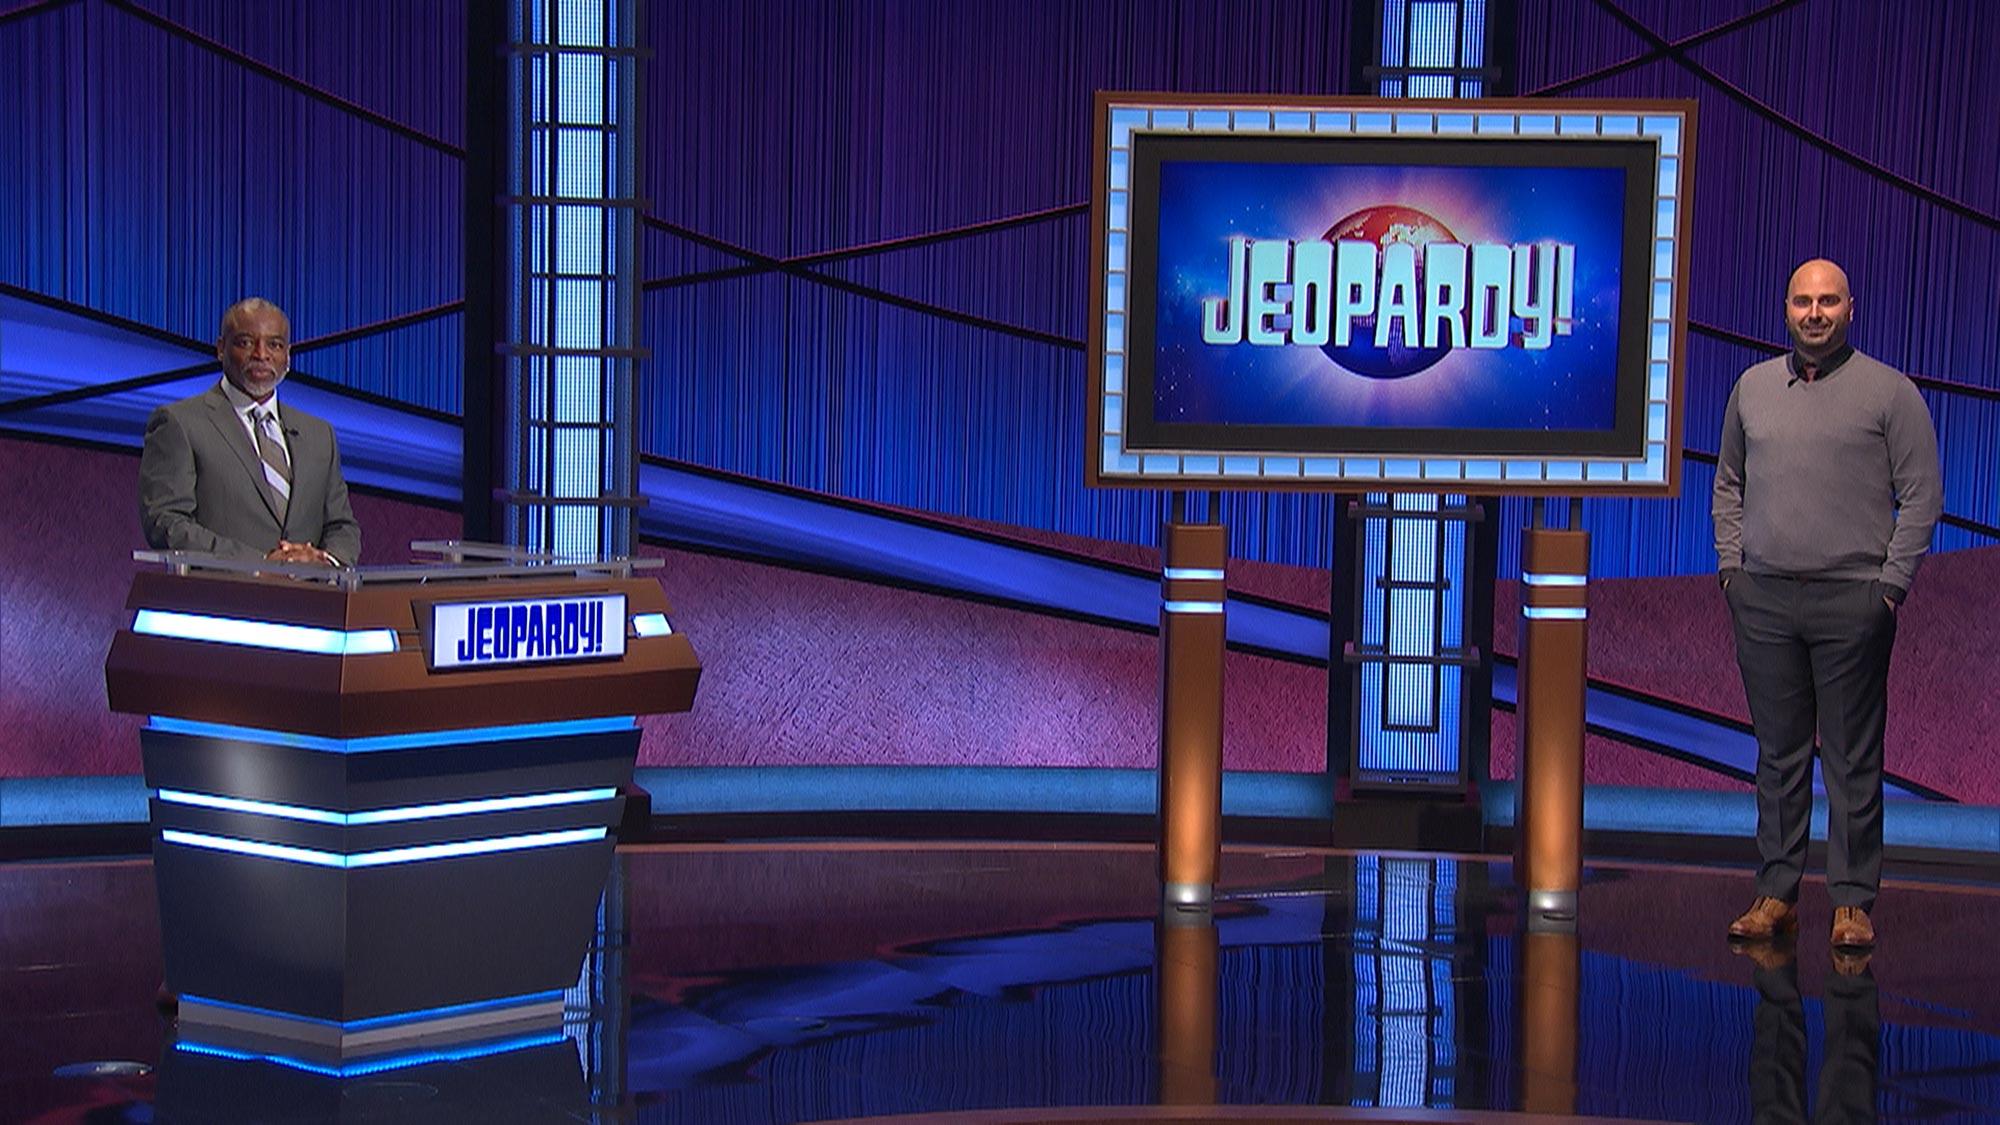 Jeopardy- LeVar Burton and Patrick Pearce